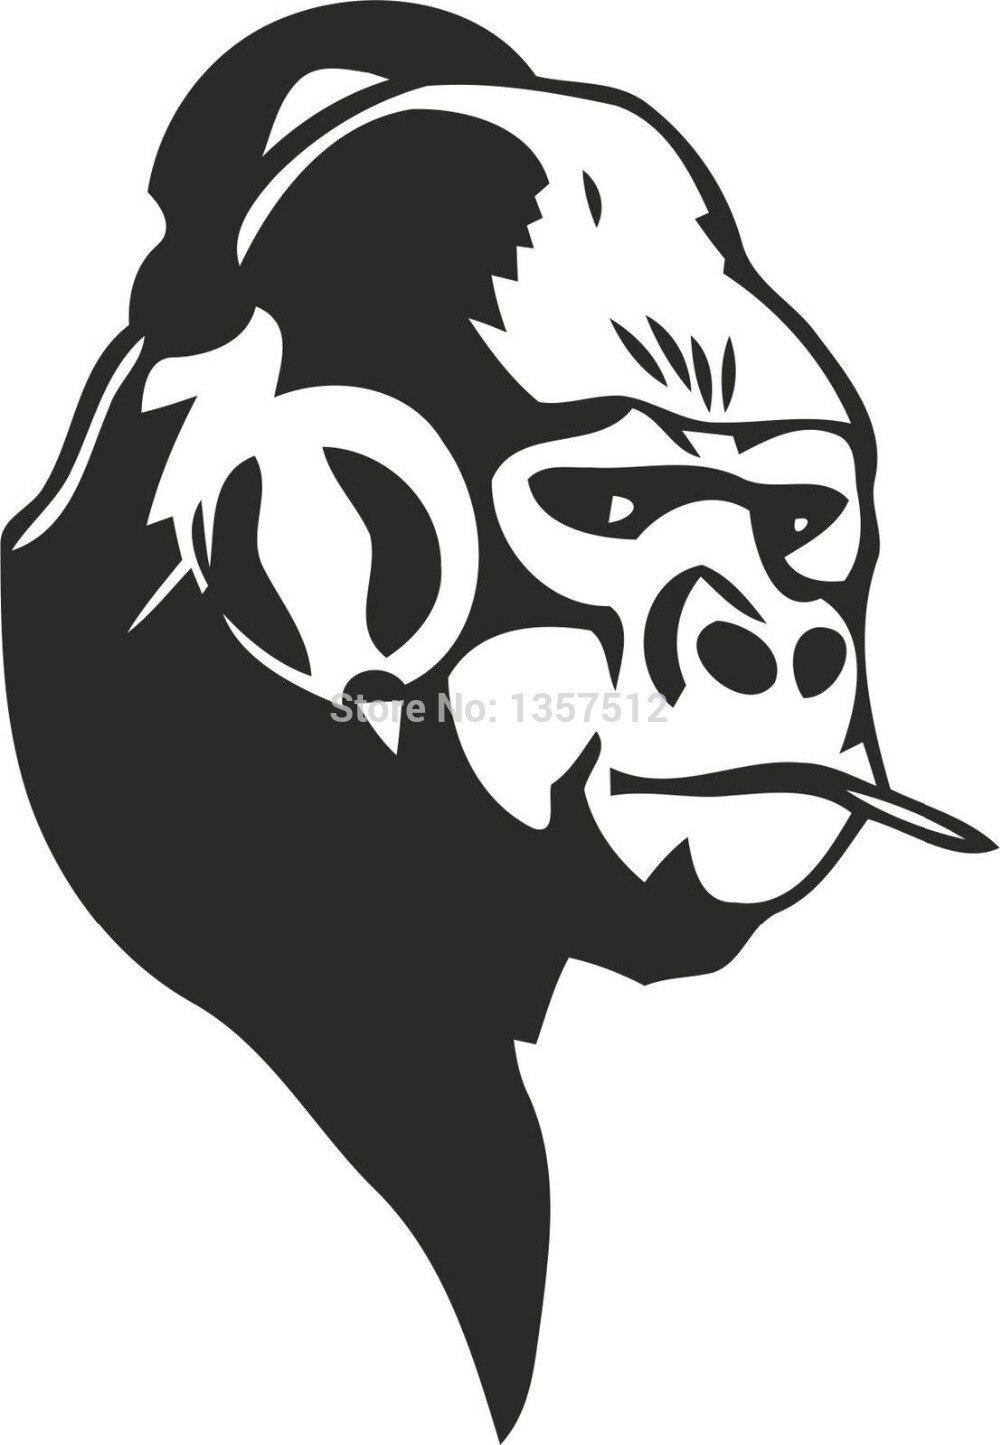 Online Buy Wholesale Gorilla Glue From China Gorilla Glue